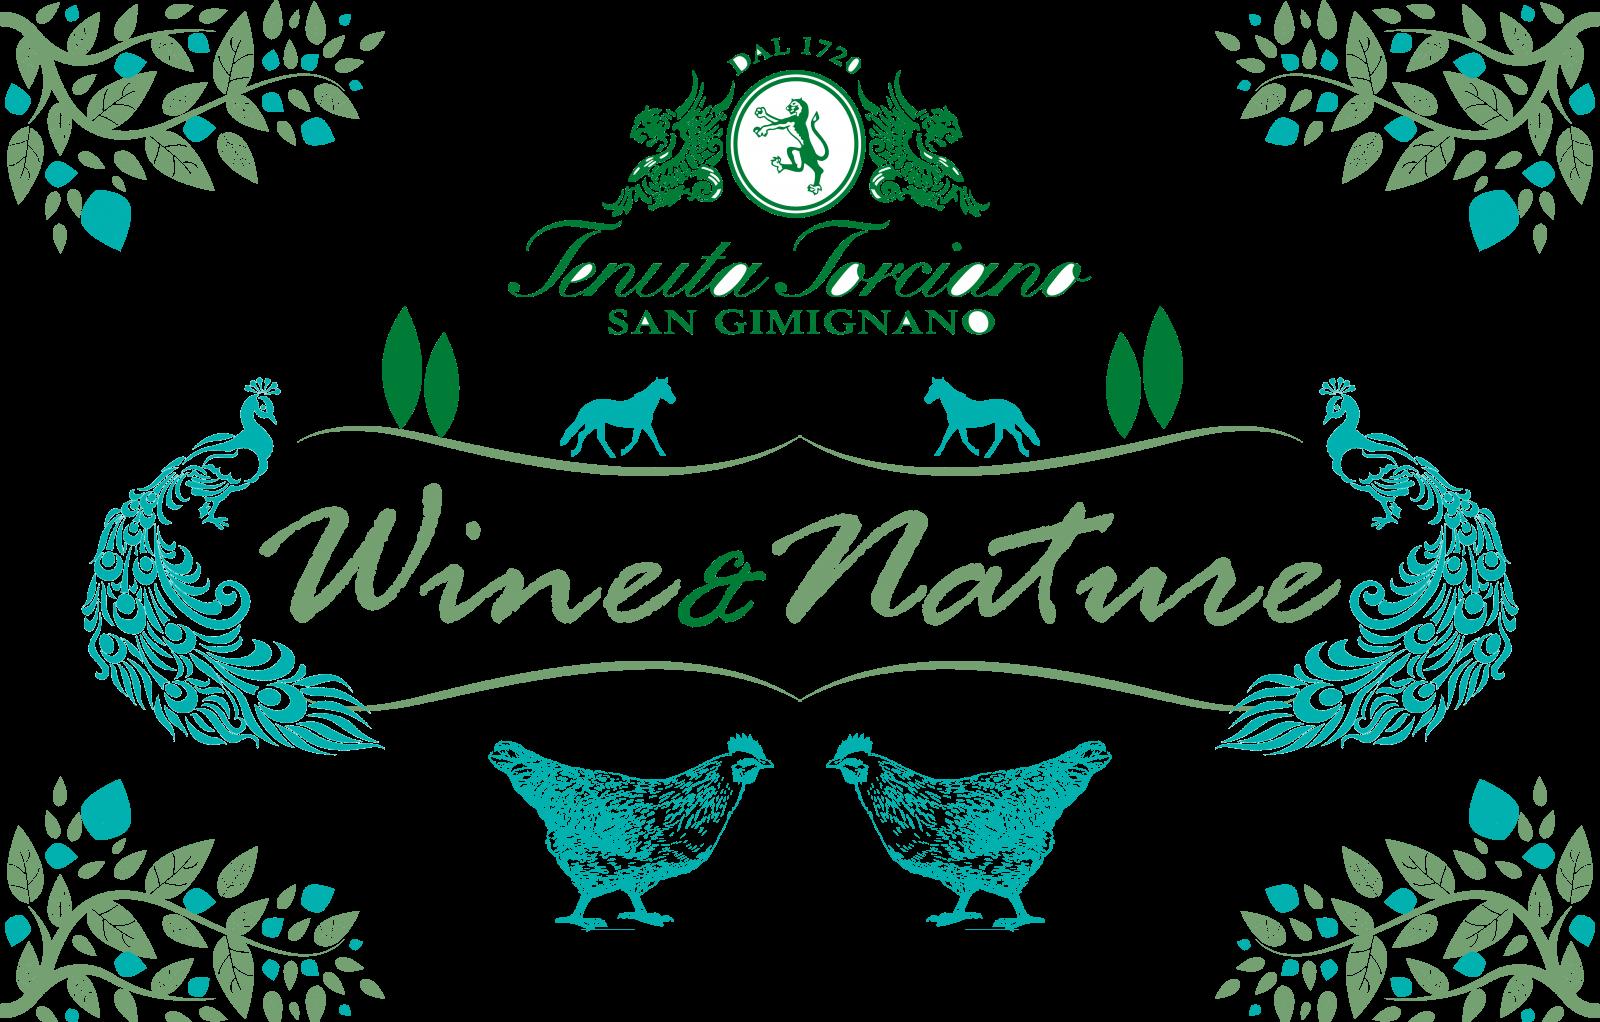 Tenuta%Torciano%Wine%And%Nature